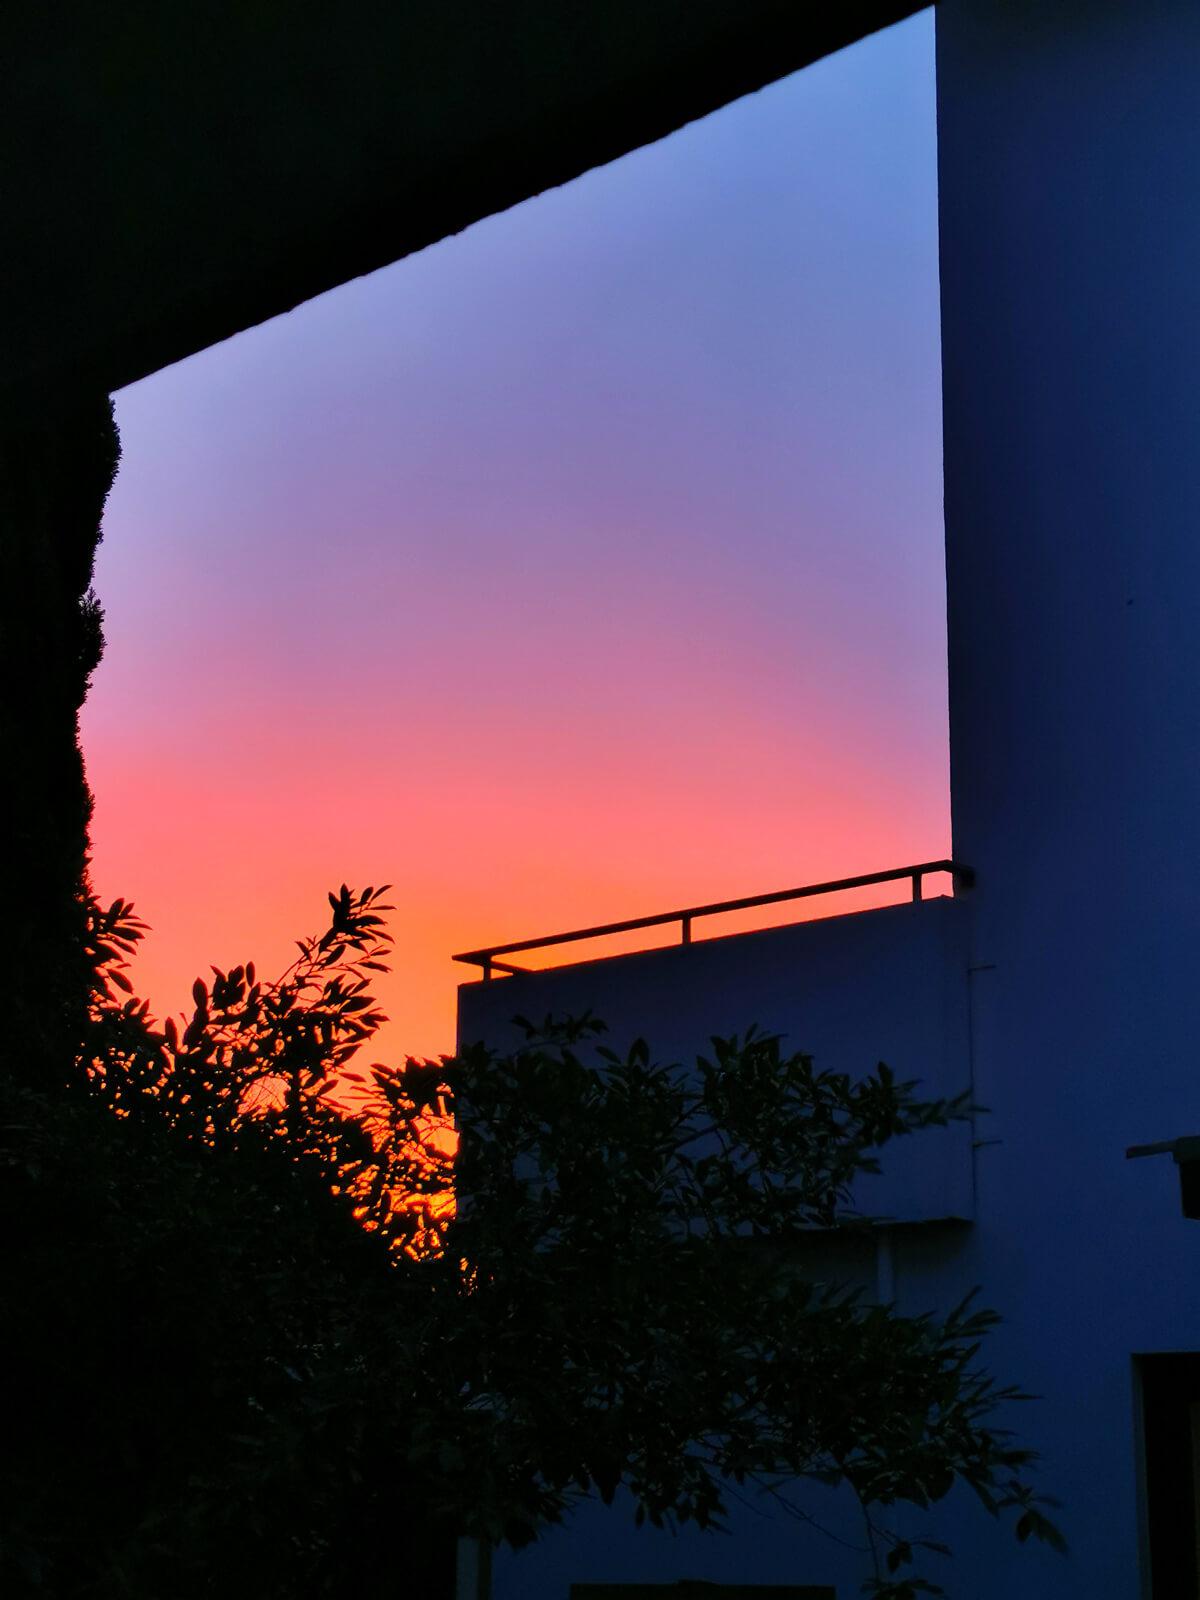 Farbverlauf im Himmel